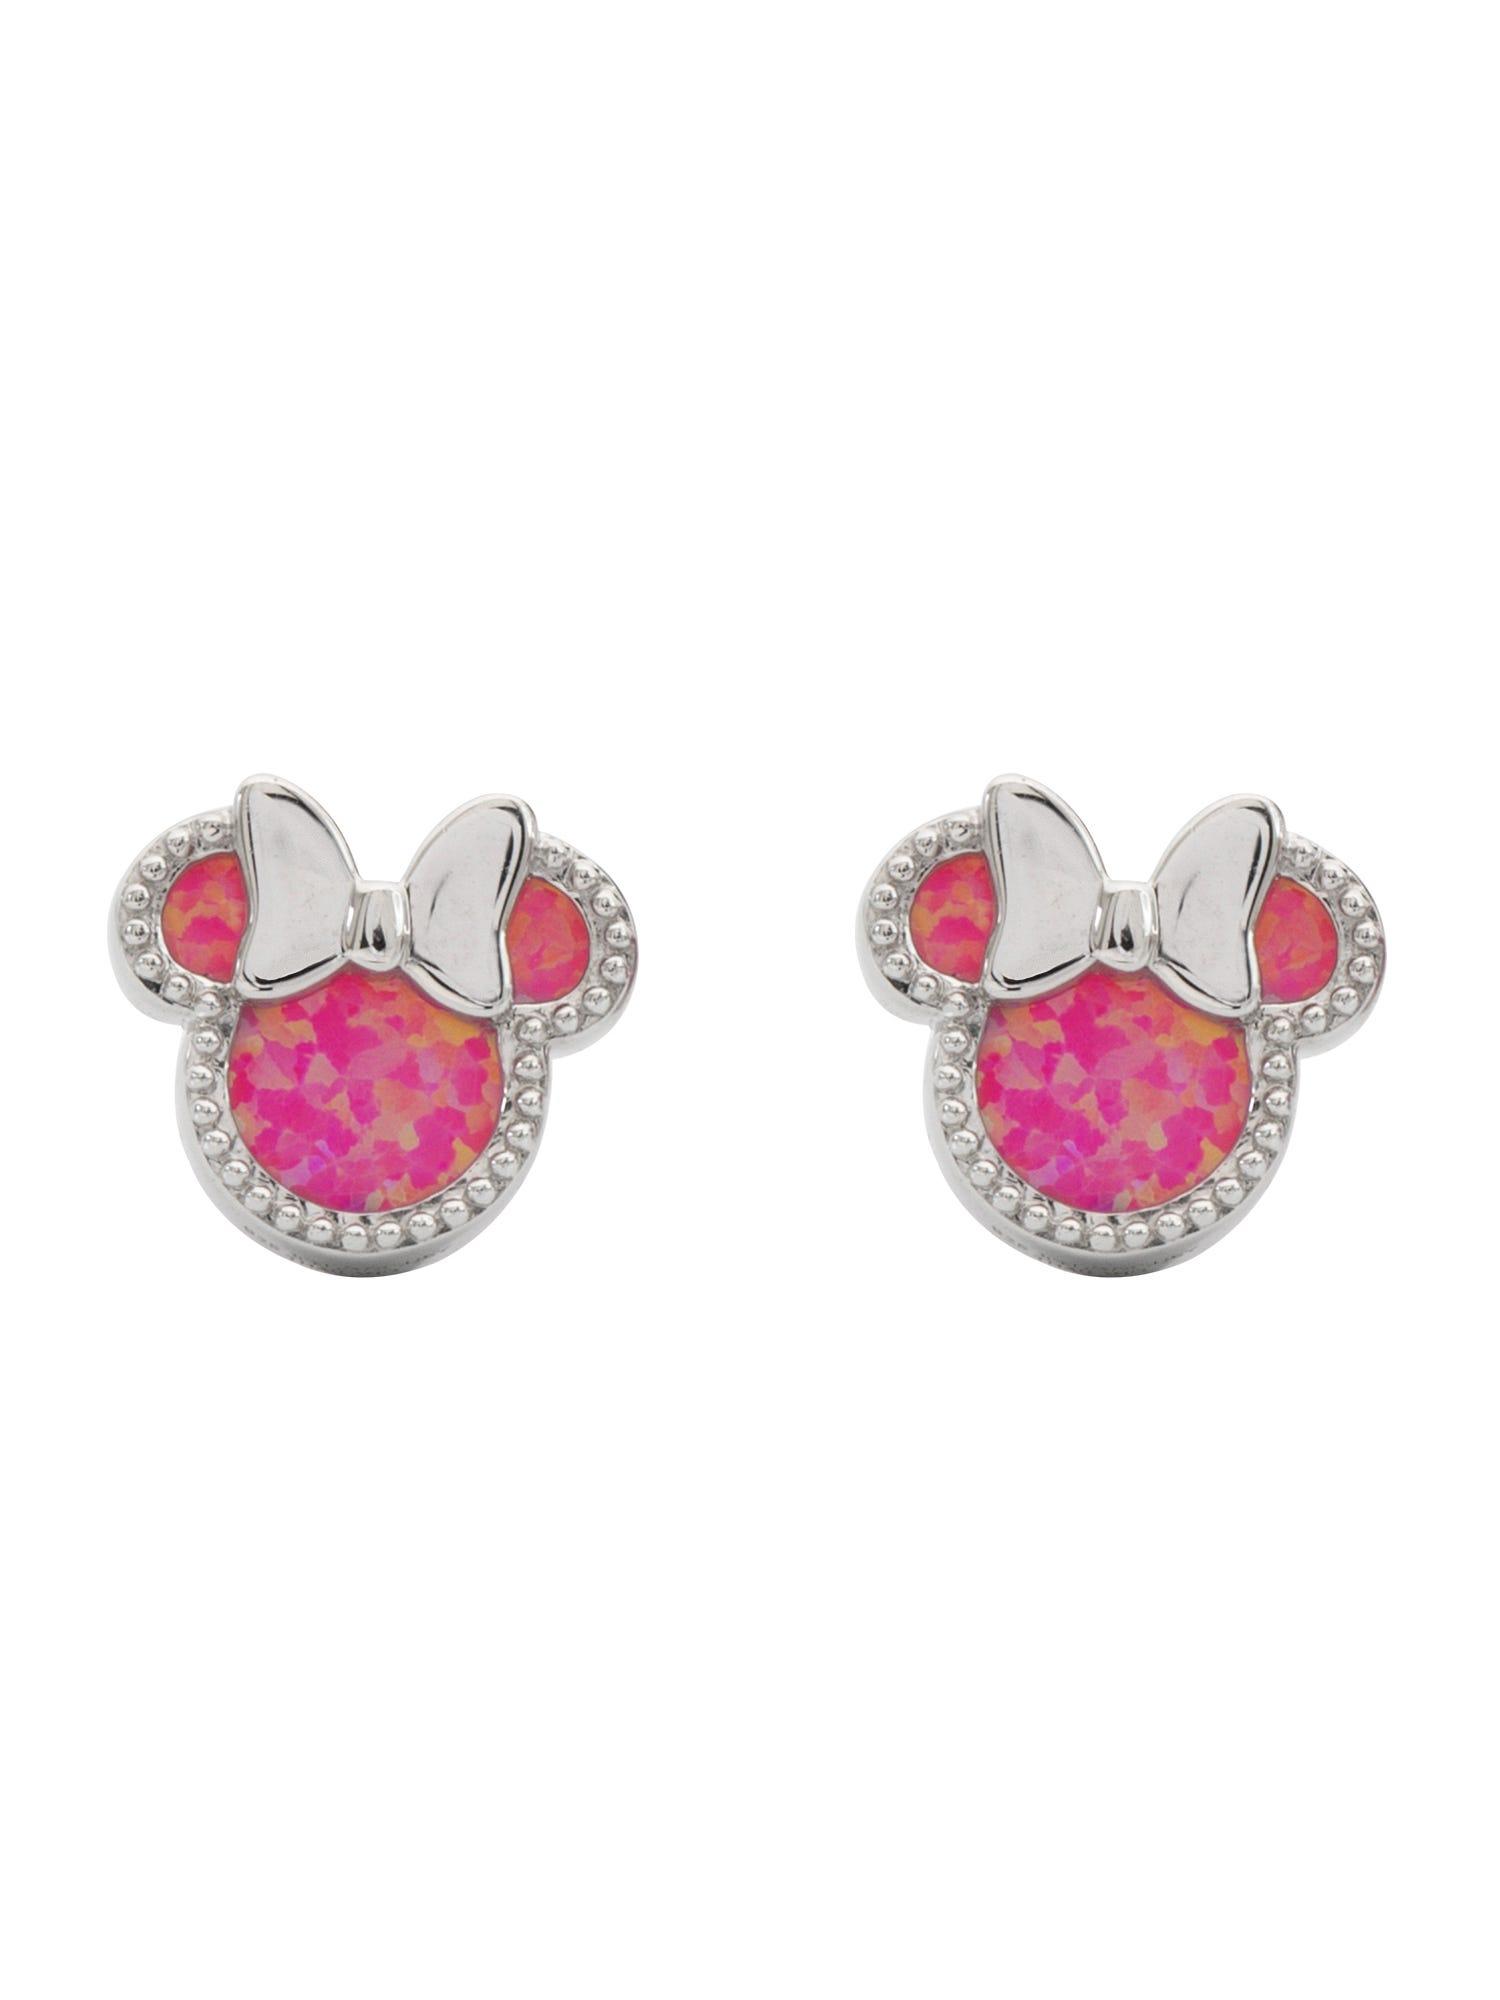 DISNEY© Minnie Mouse Created Opal CZ Stud Earrings in Sterling Silver